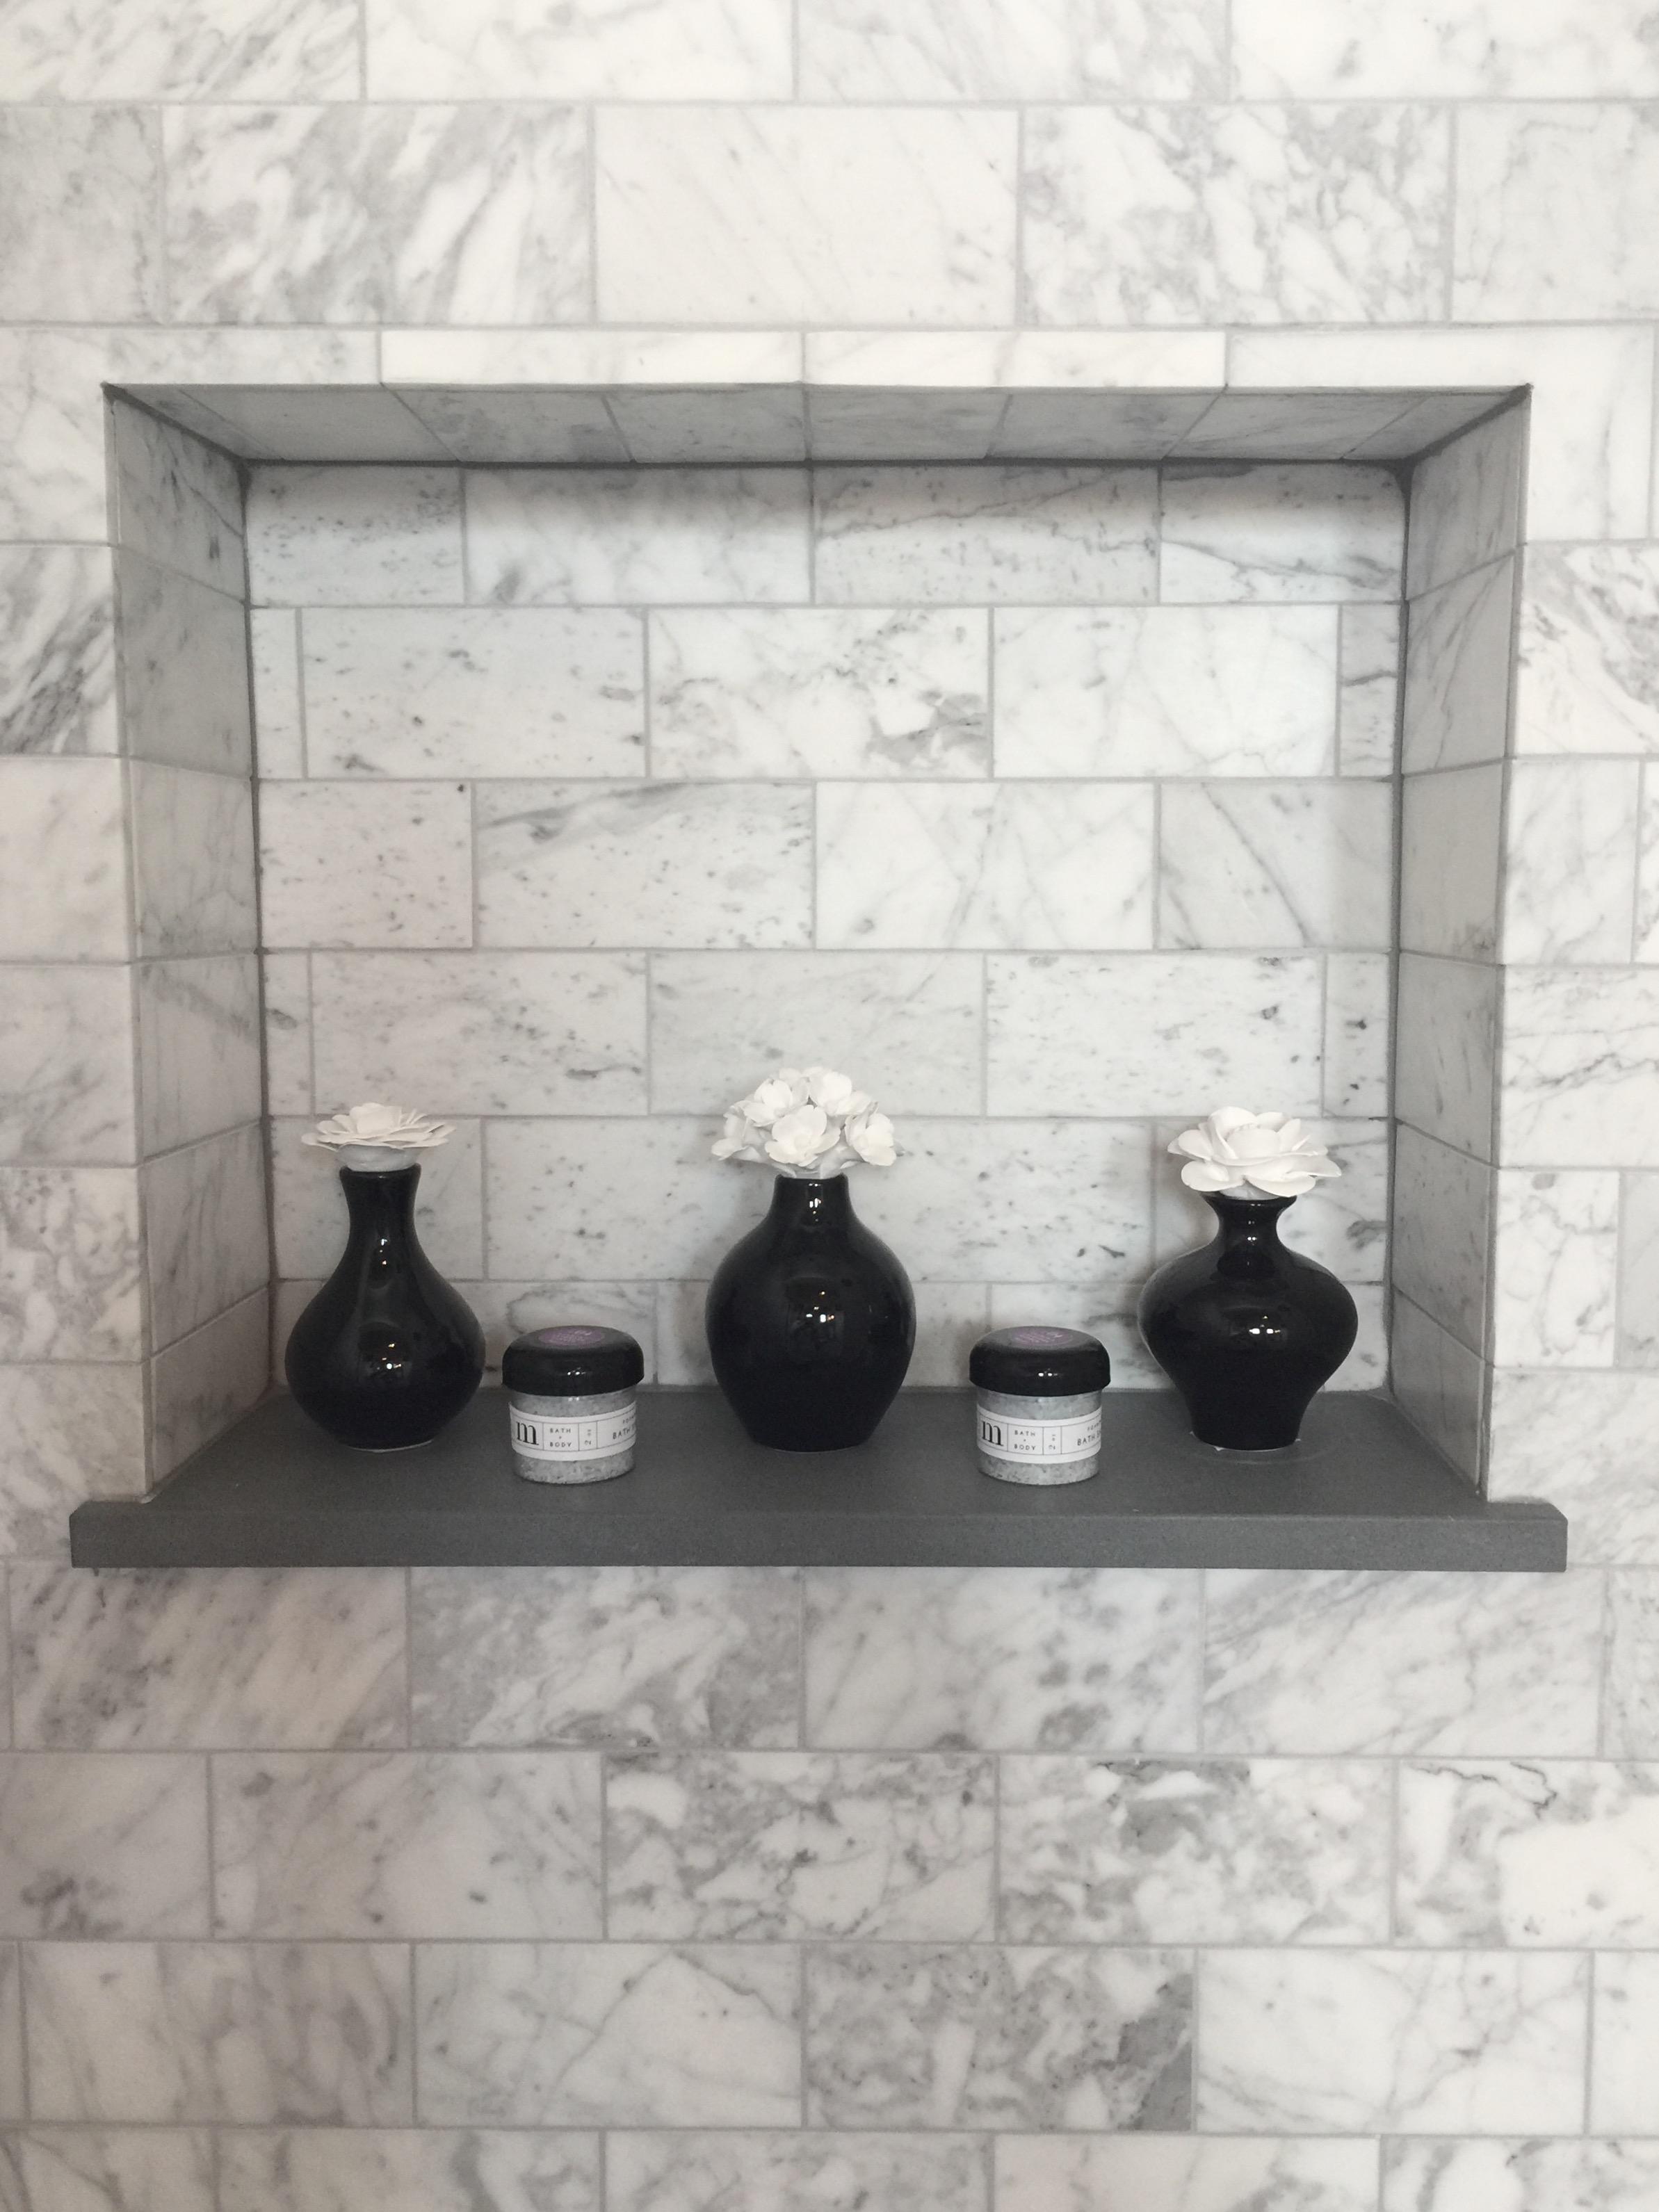 Shampoo niche details in the bathroom designed by Desiree Engram